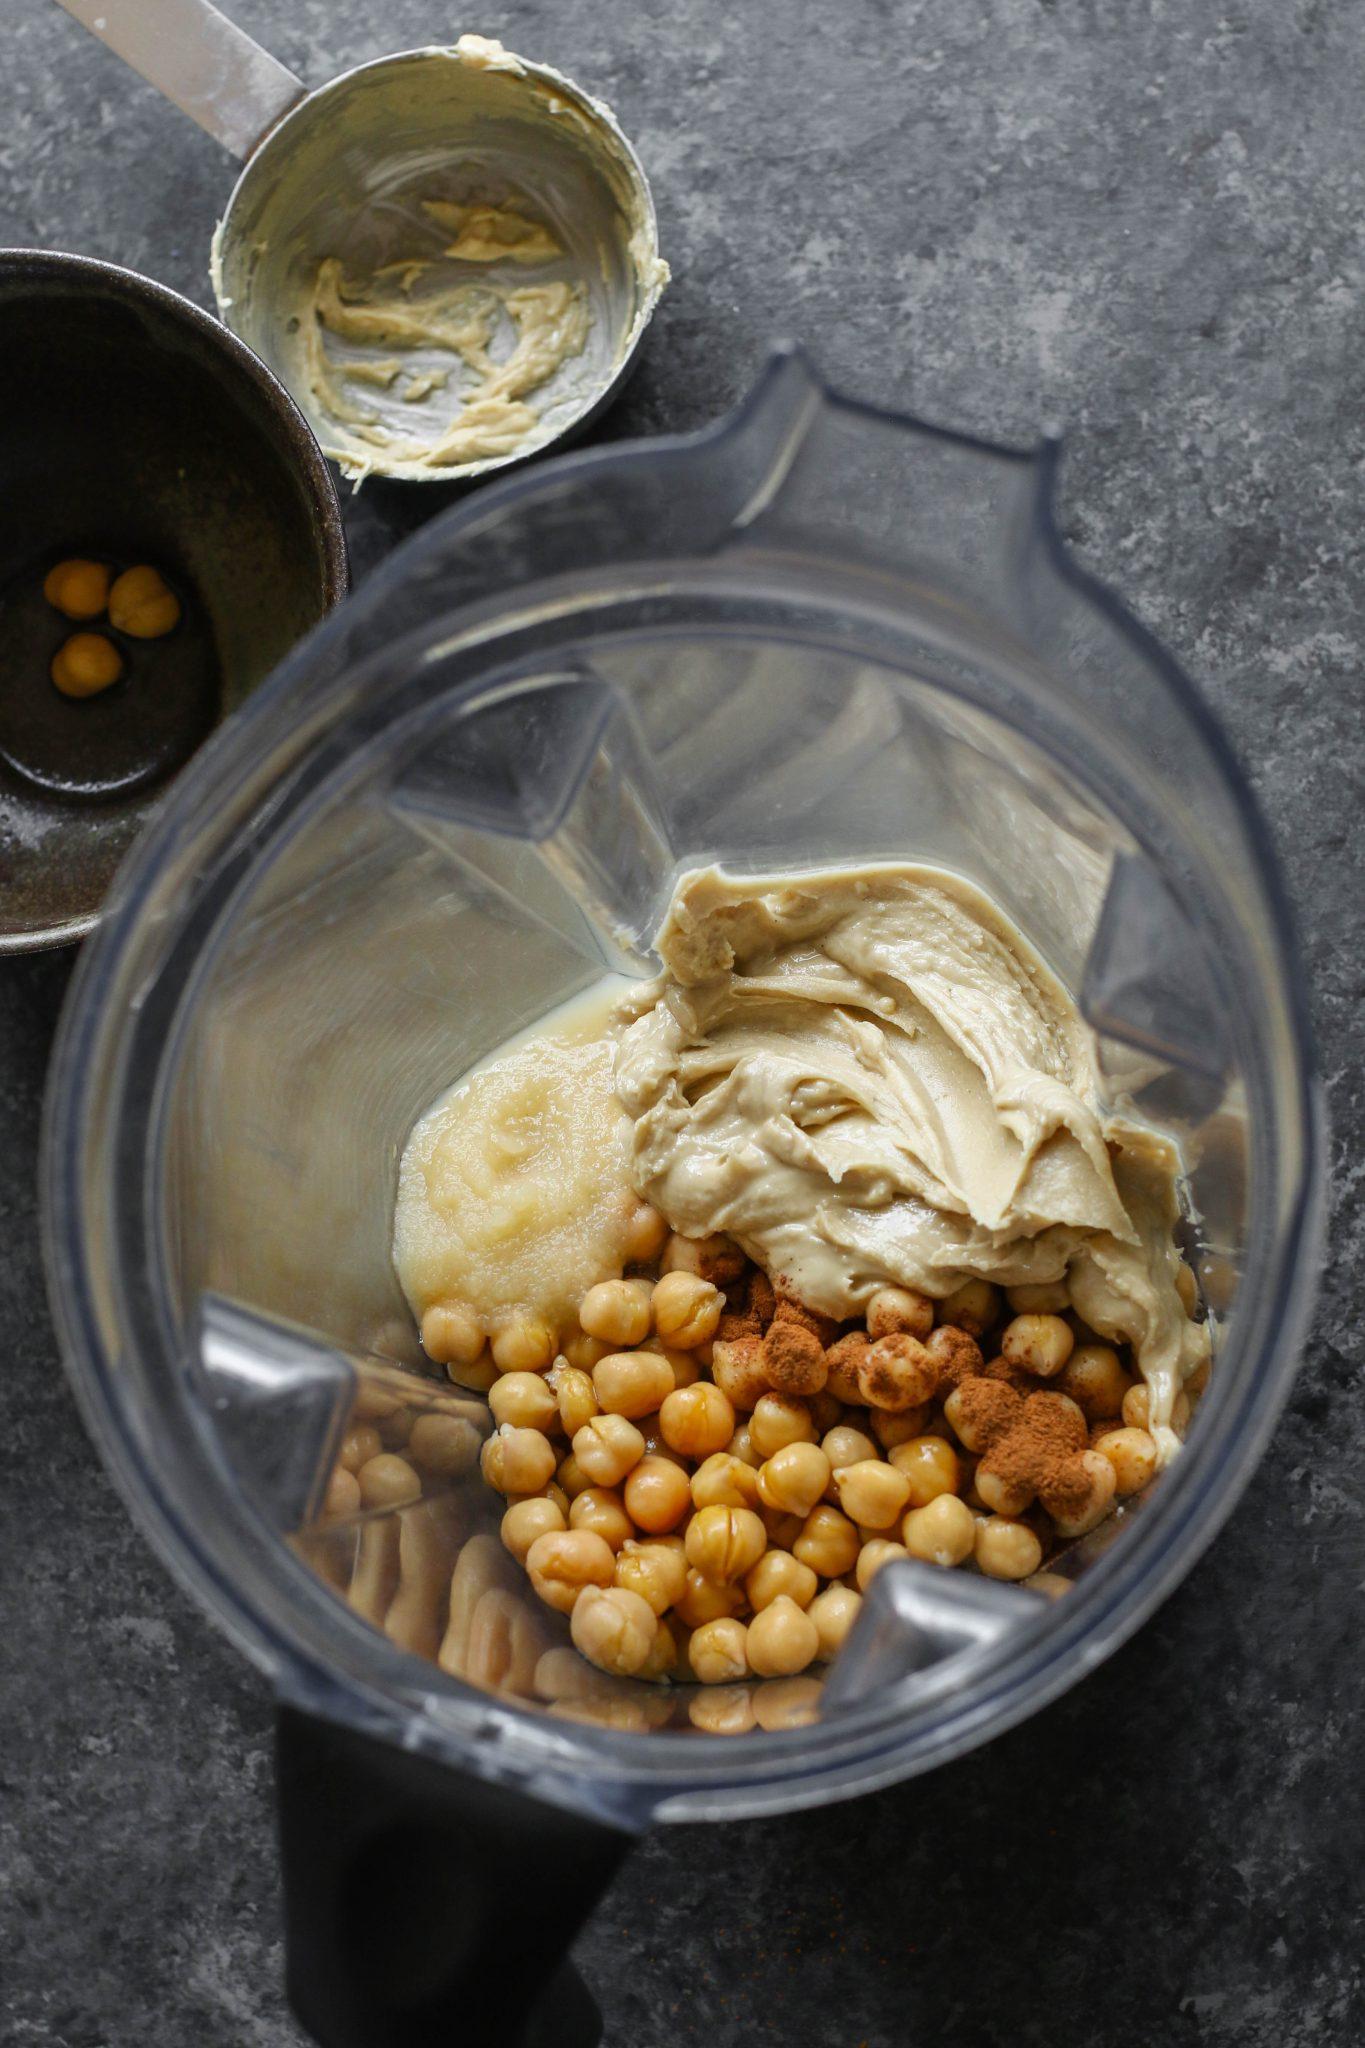 Cashew Butter Chickpea Snack Cookies Ingredients in blender